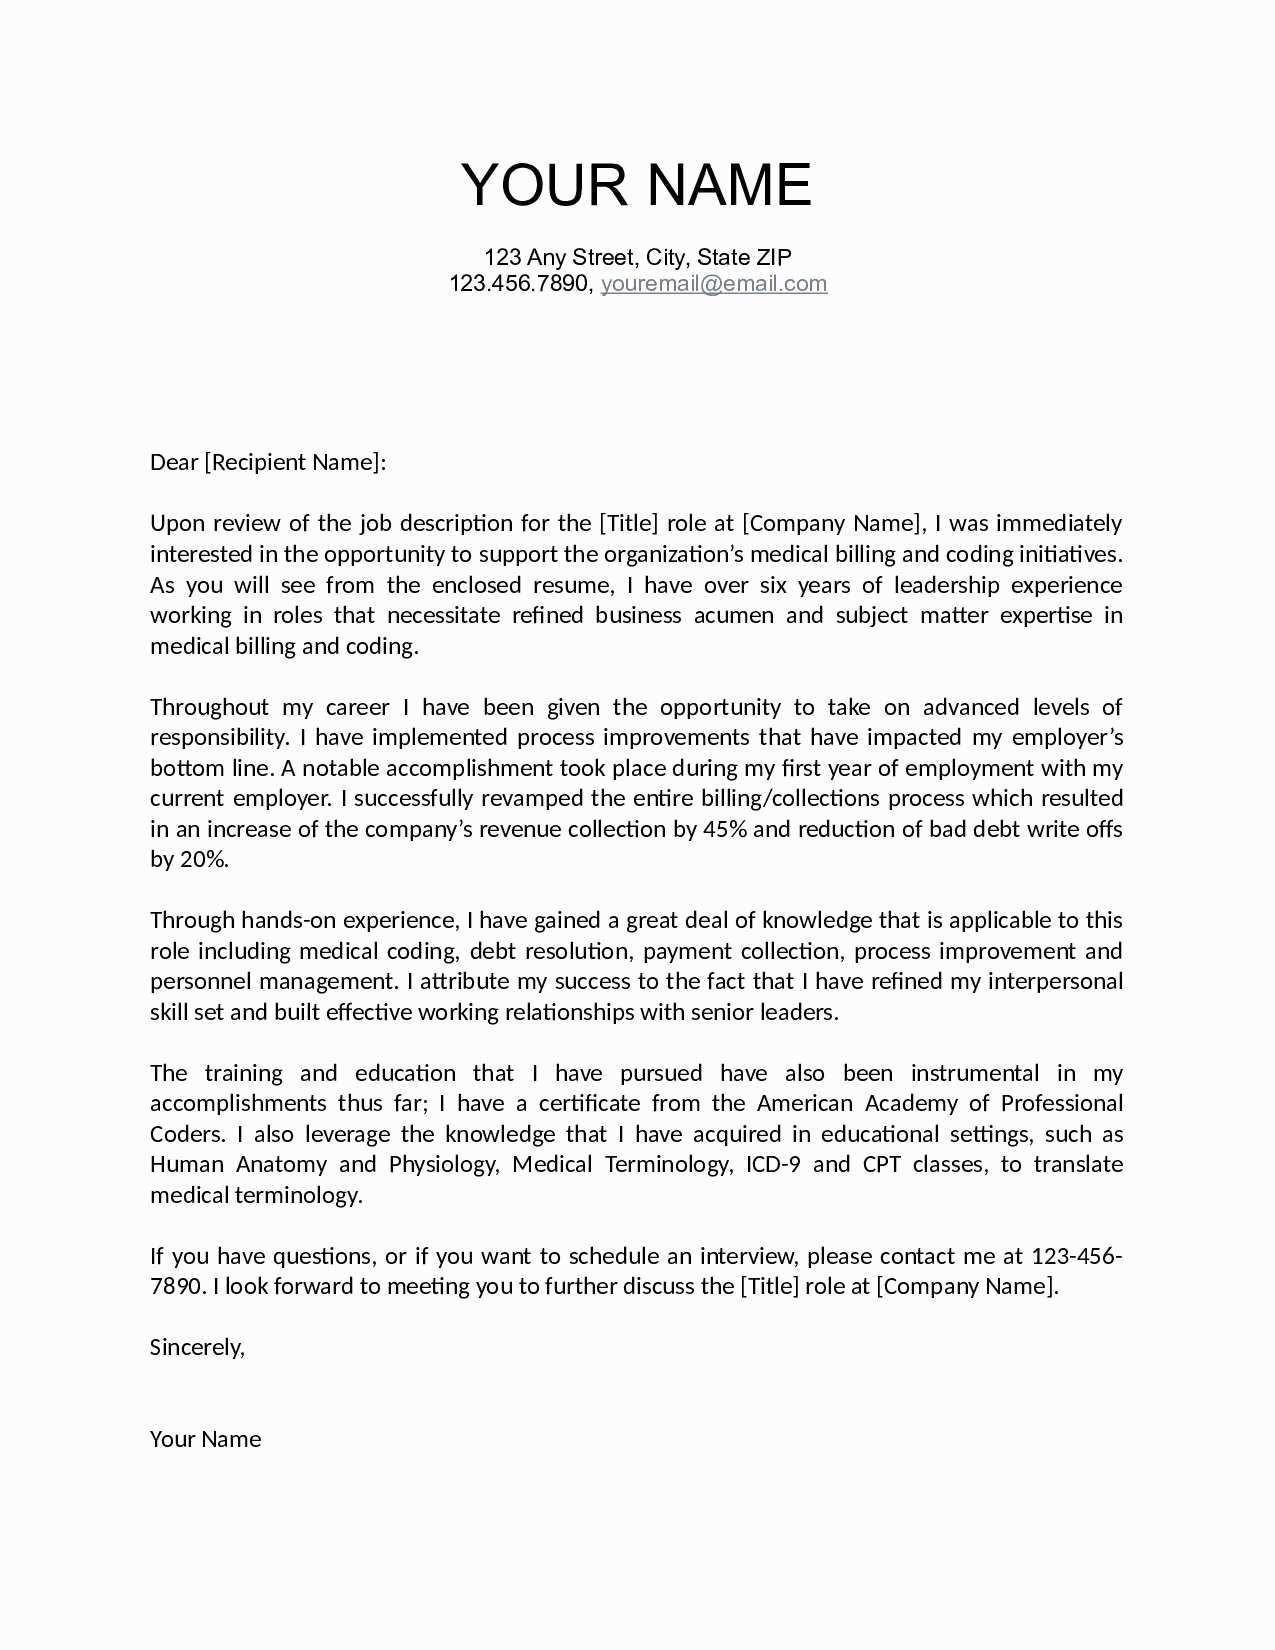 Proper Cover Letter Template - Covering Letter for Work Experience Best Job Fer Letter Template